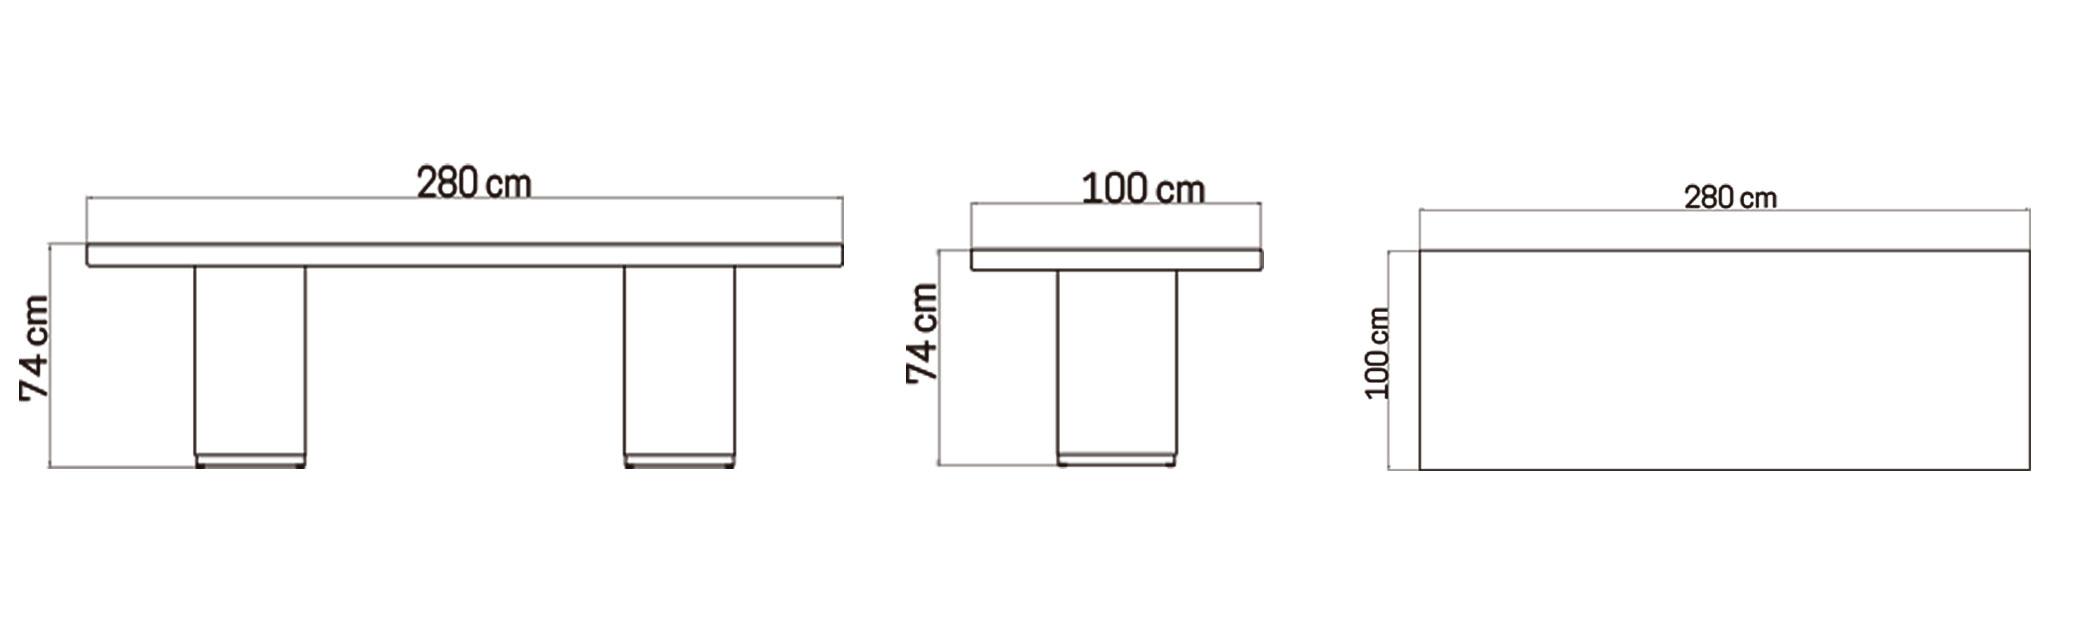 Mesa Comedor Rectangular 280cm - Skyline Design